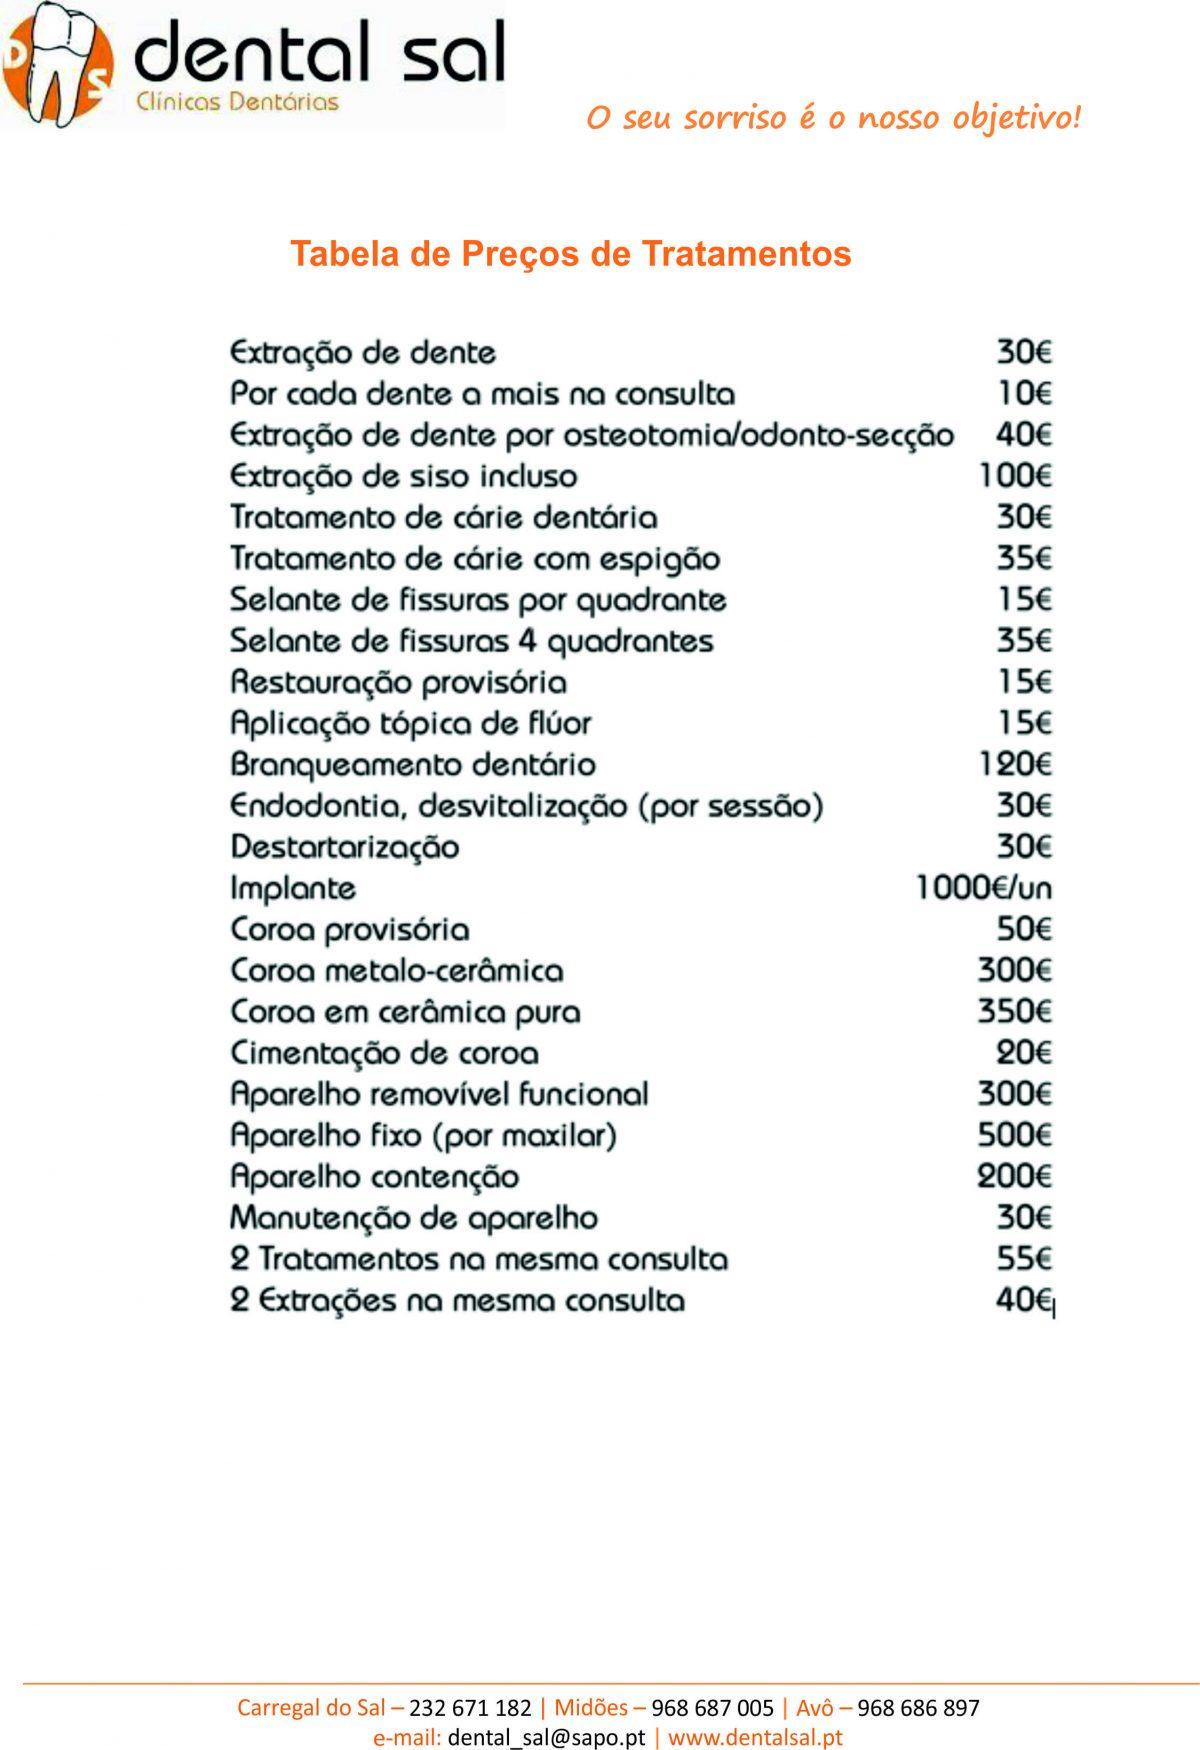 tratamentos-1200x1750.jpg